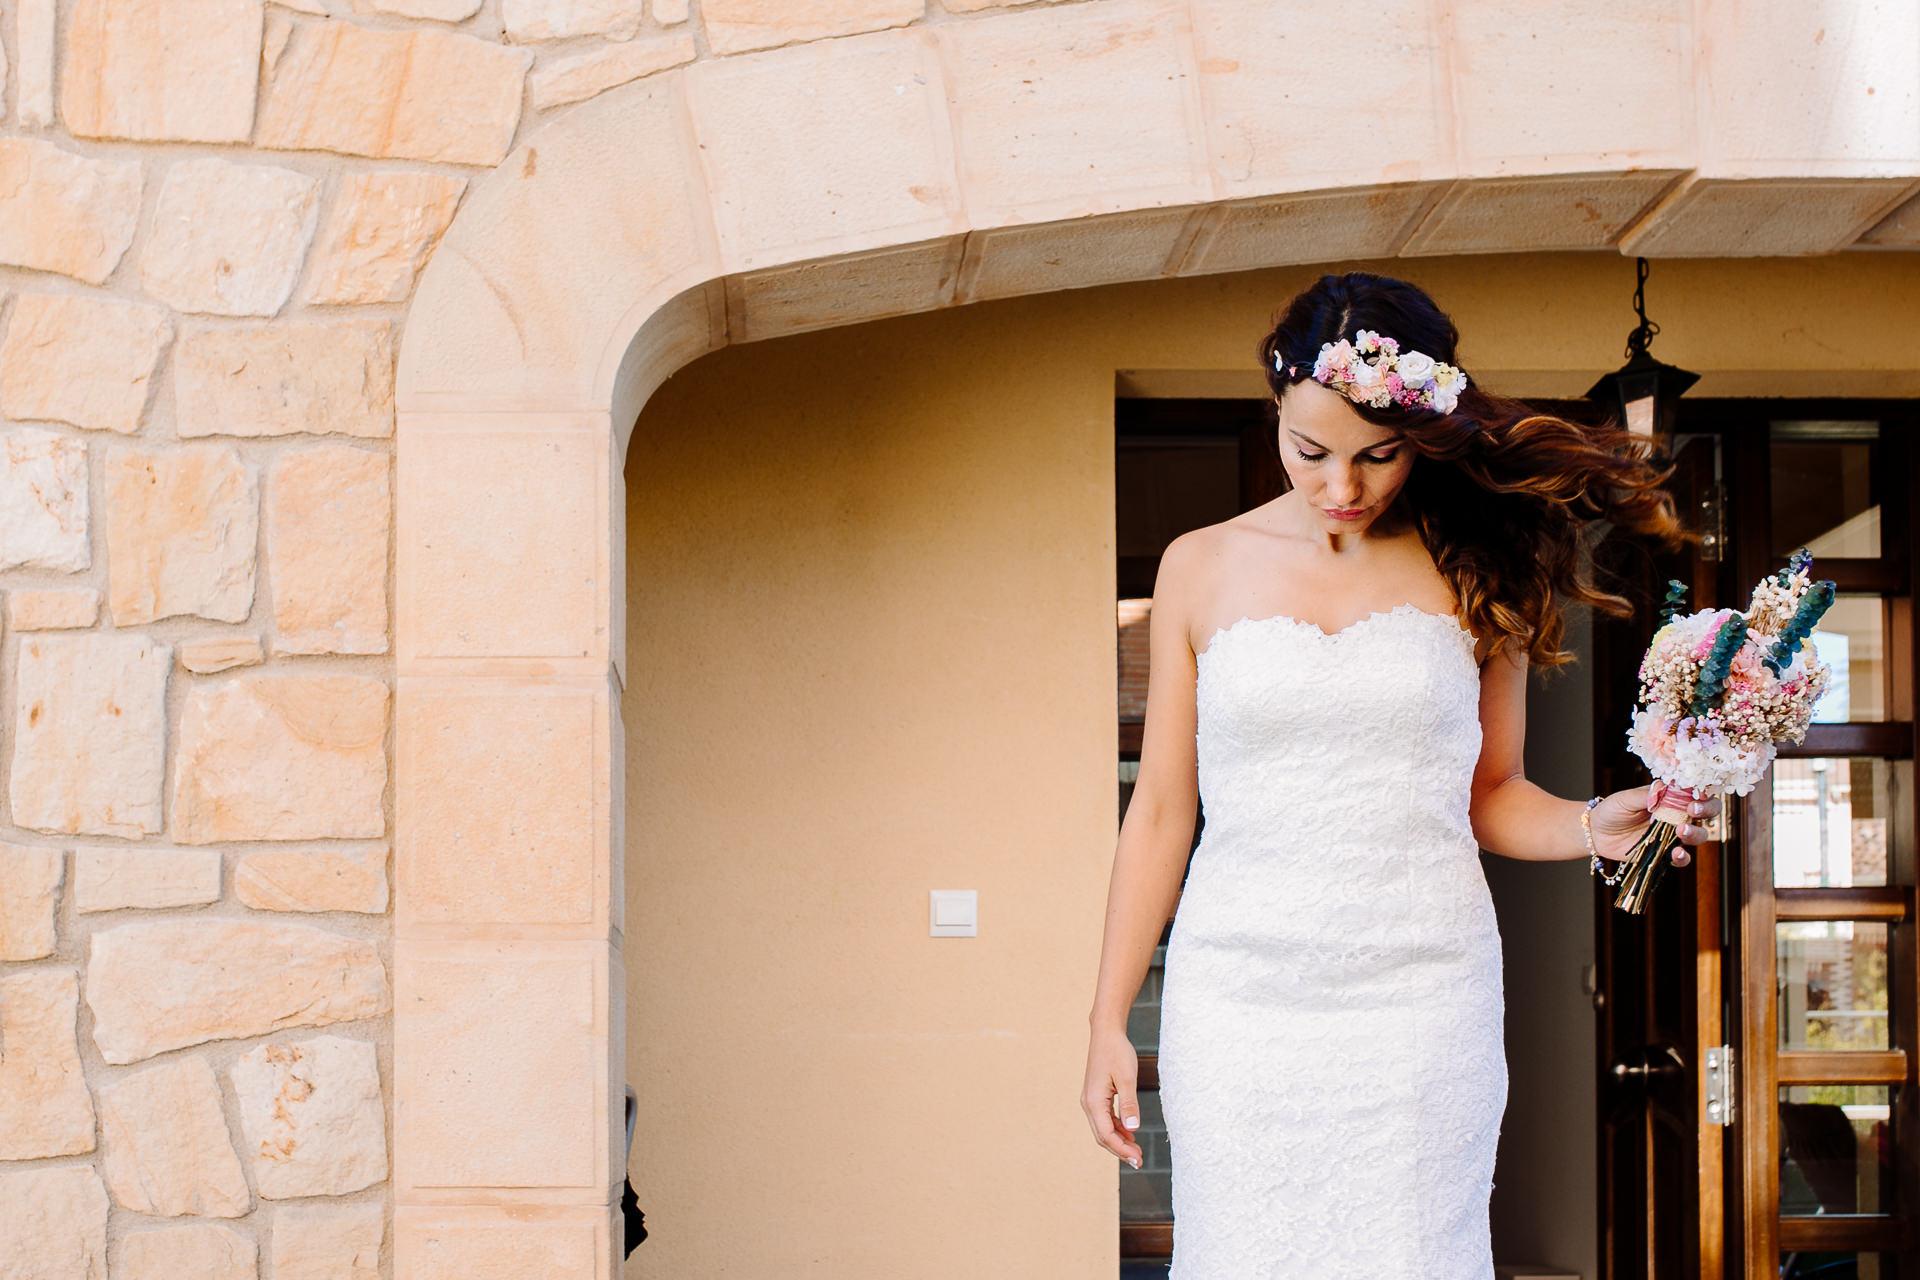 boda civil vinedos larioja lola berantevilla 123713